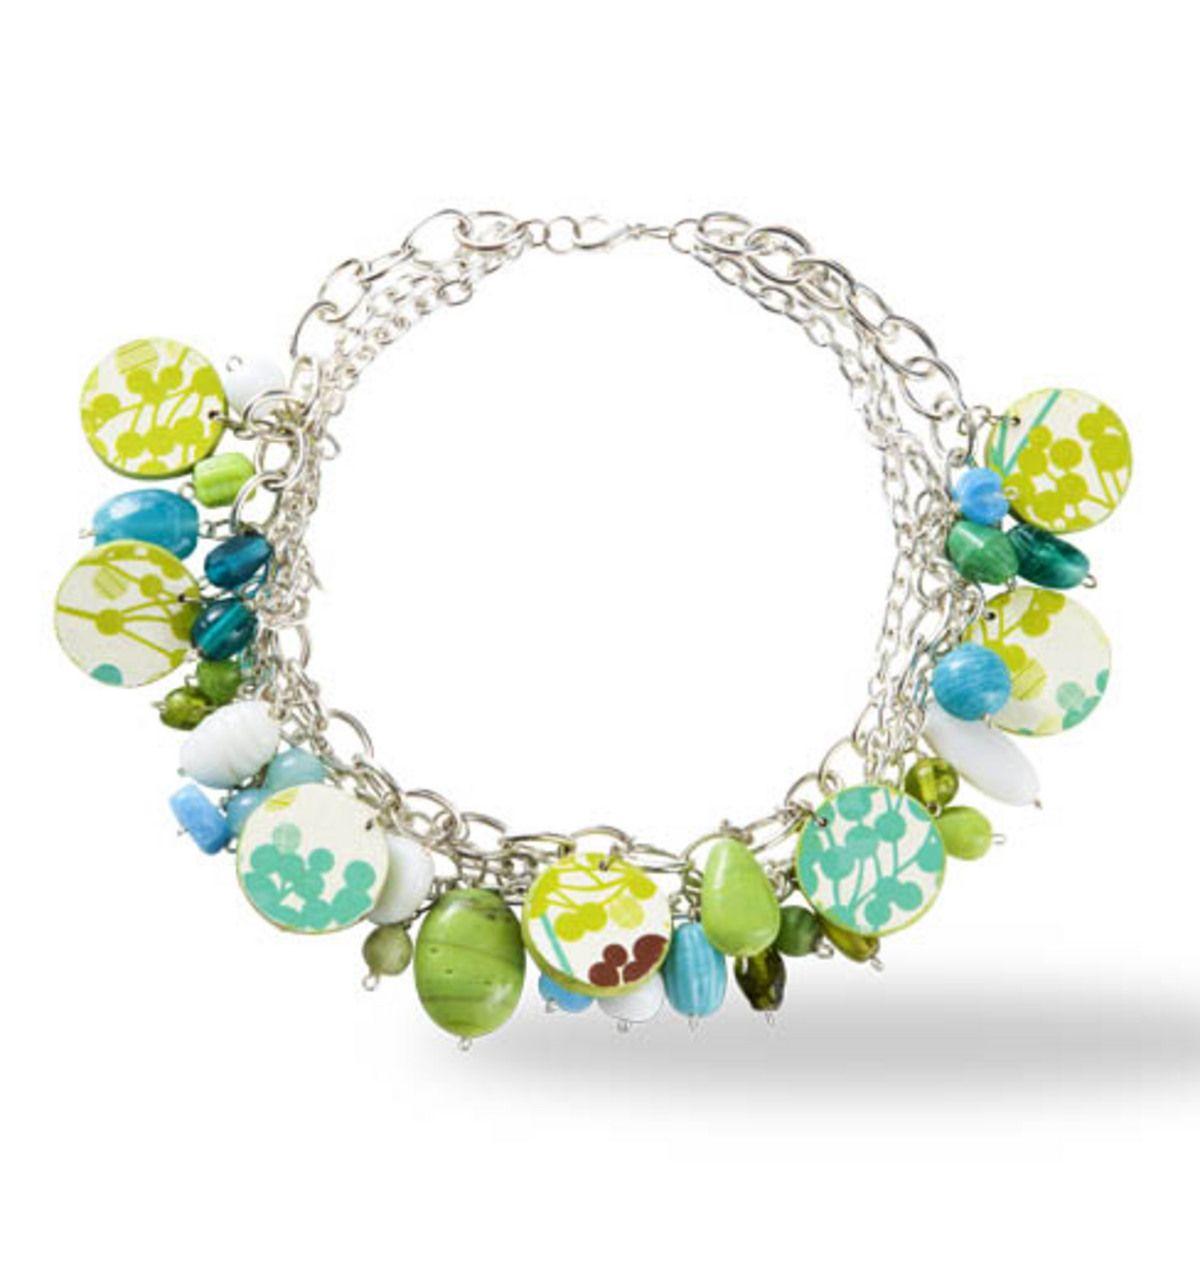 Dazzling Decoupage Necklace at Joann.com | Home | Pinterest | Decoupage